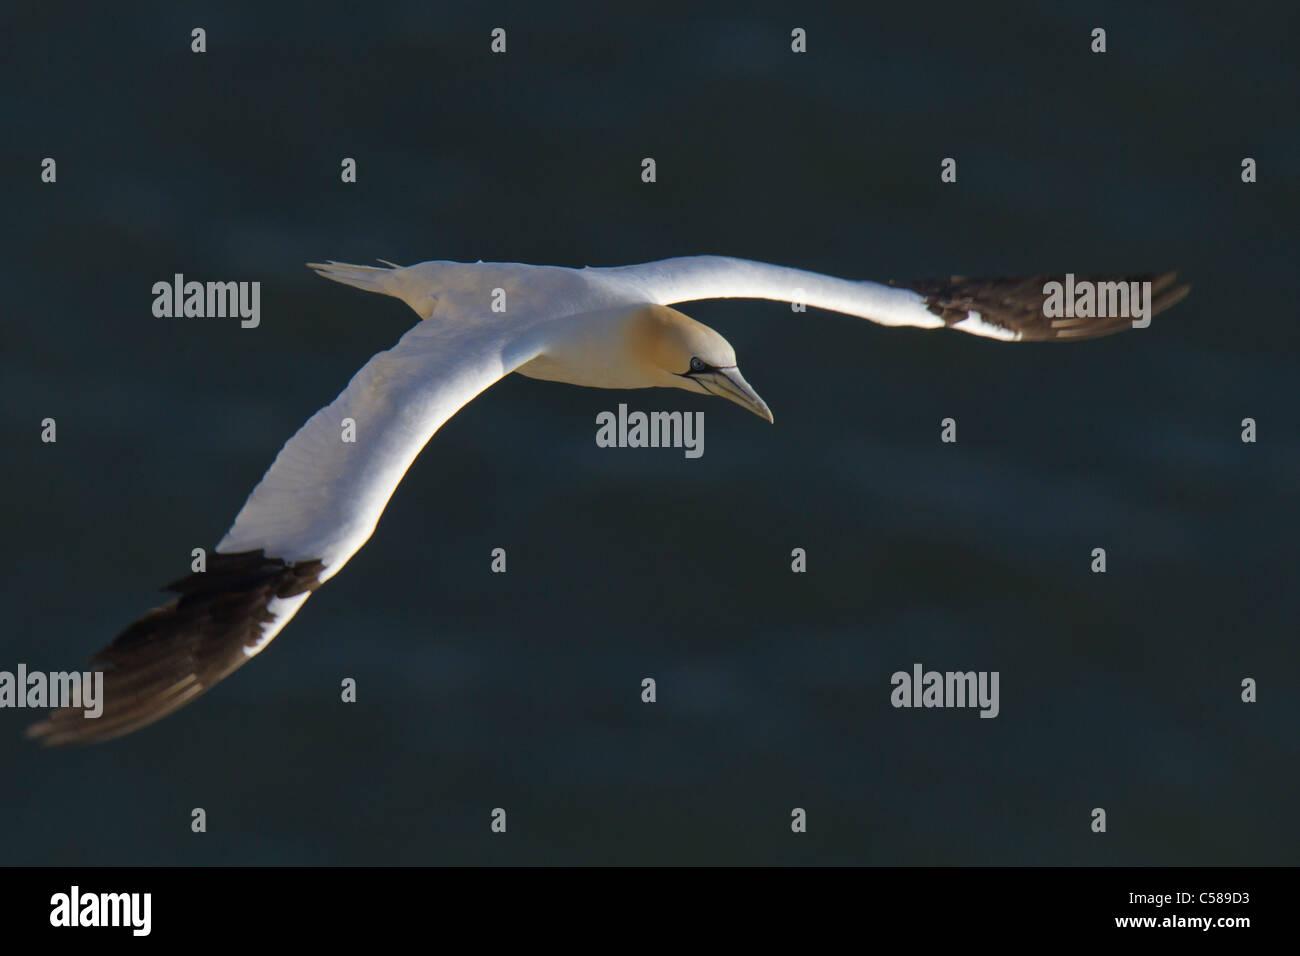 Northern Gannet (Morus bassanus) in flight over the sea - Stock Image